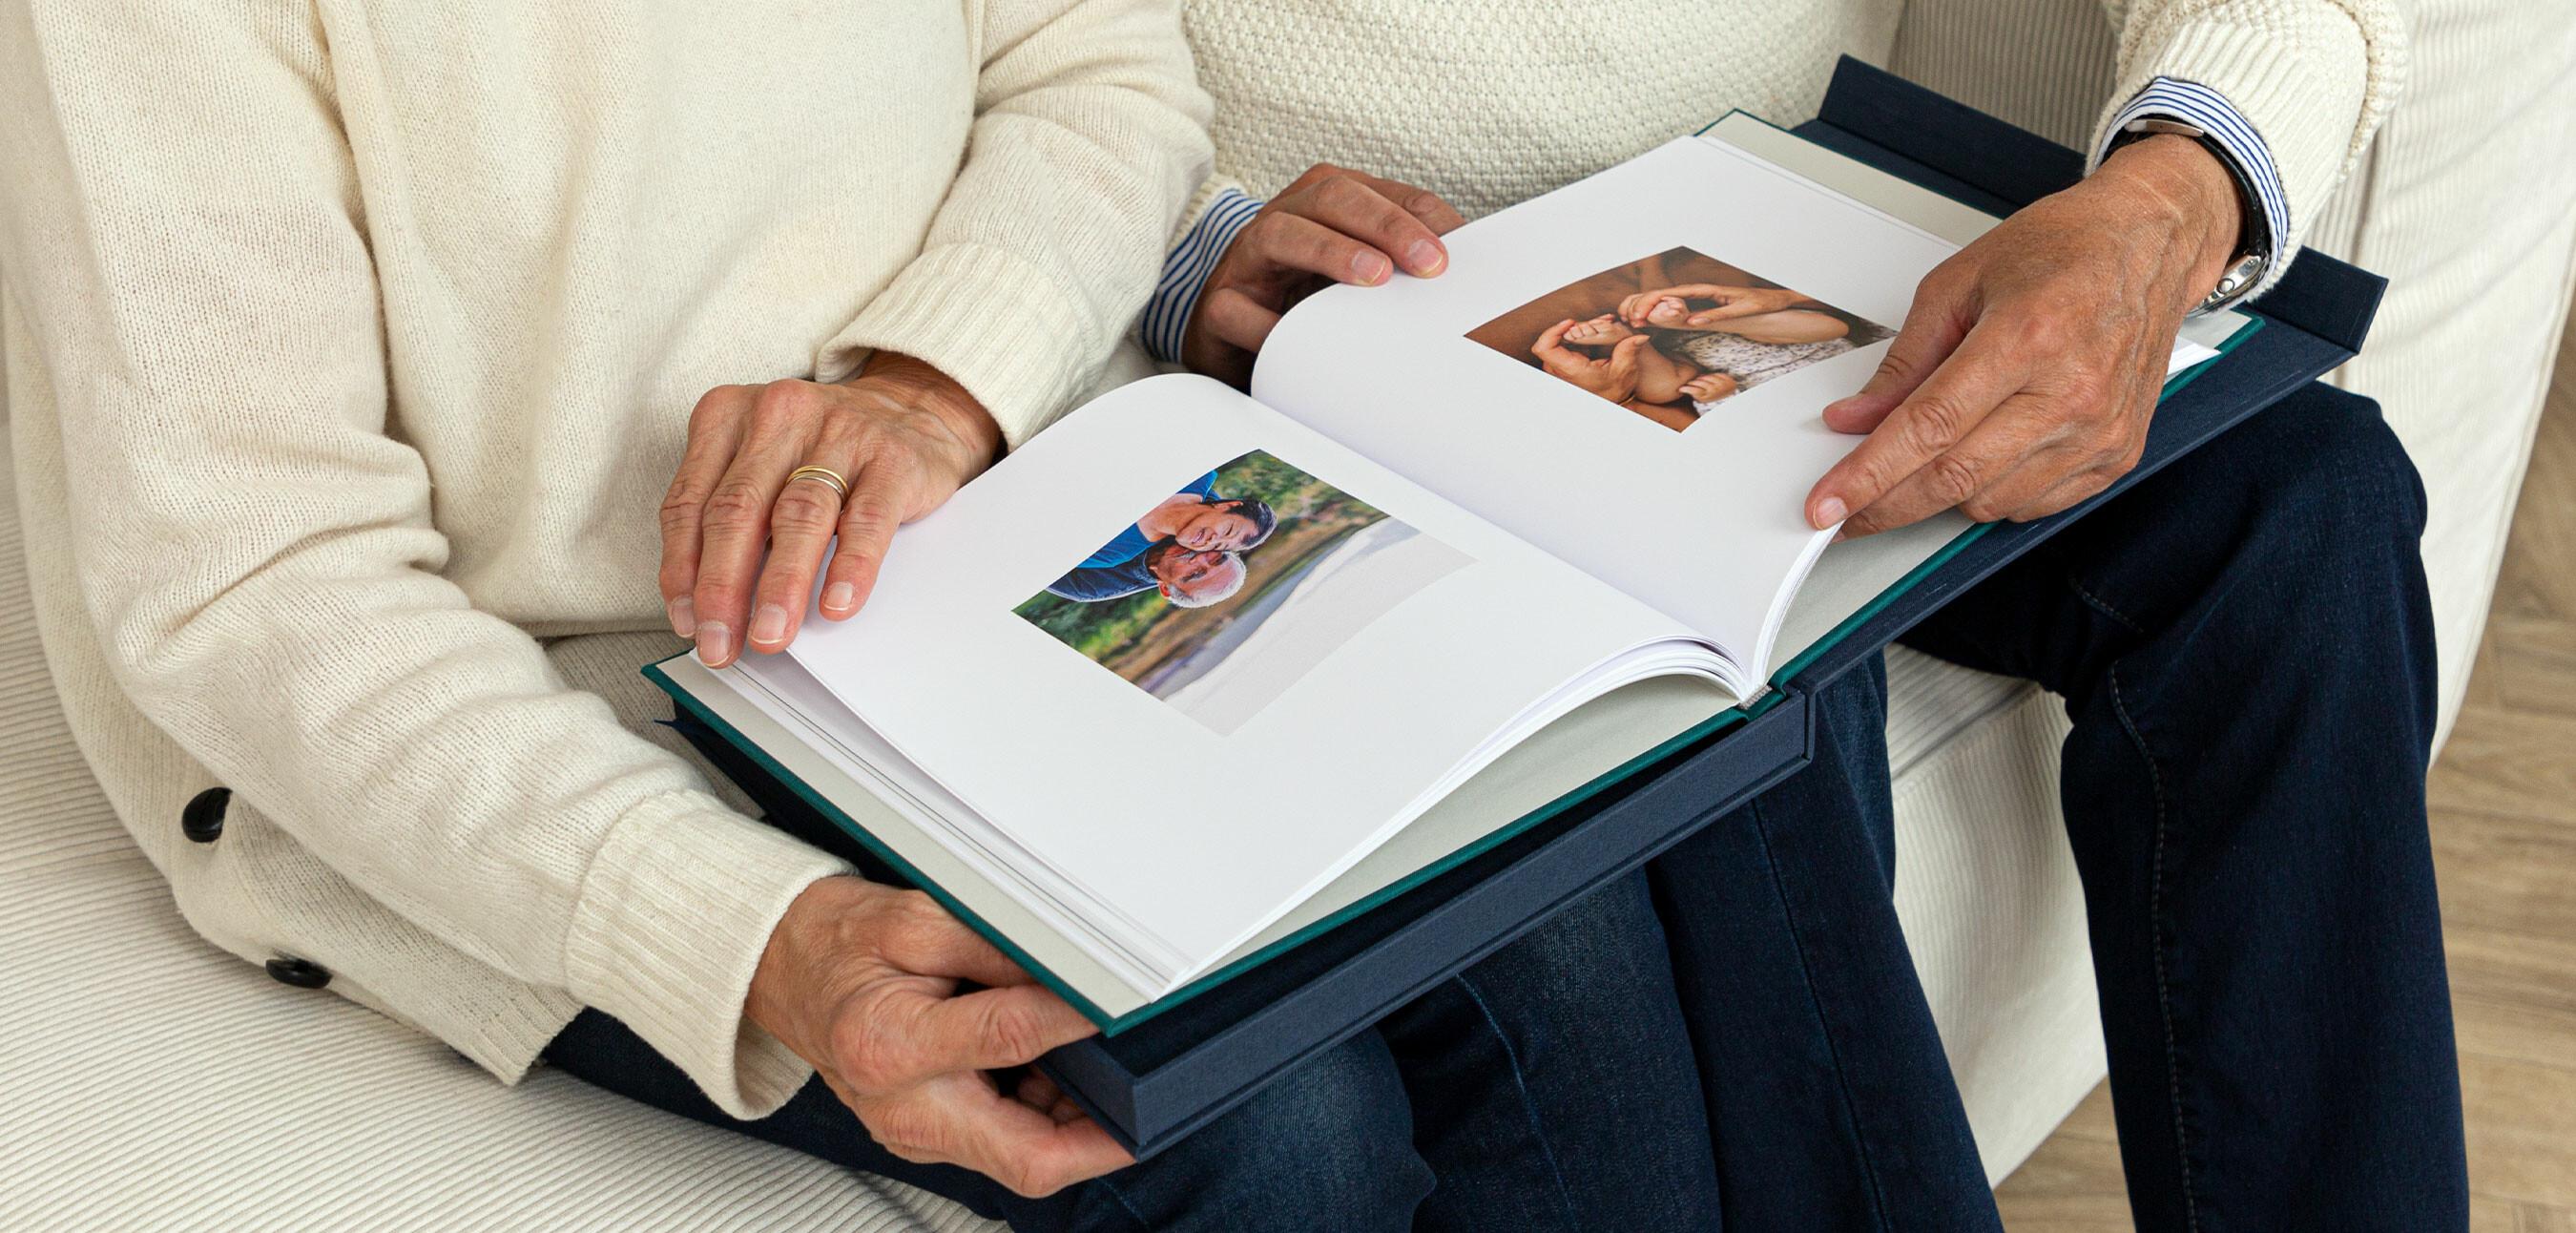 Your photo book in expert hands